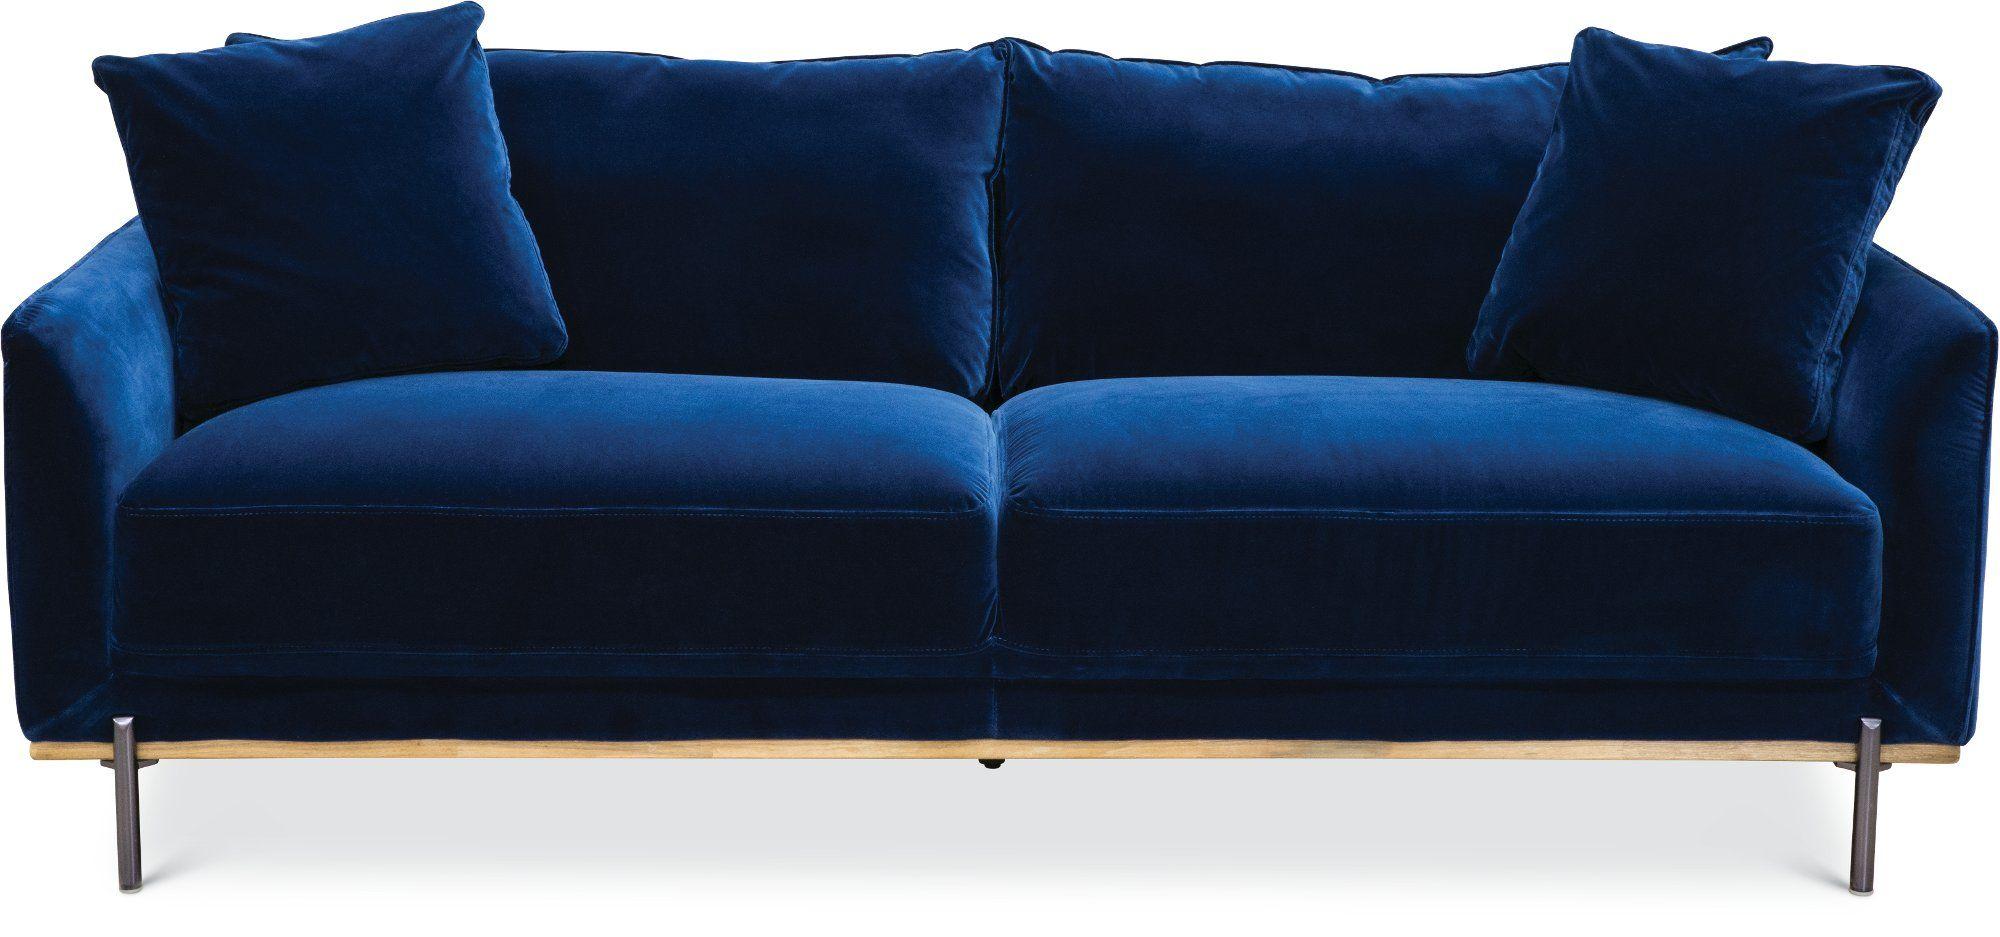 Modern Royal Blue Velvet Sofa Marseille Rc Willey Furniture Store Blue Velvet Sofa Blue Sofa Velvet Sofa